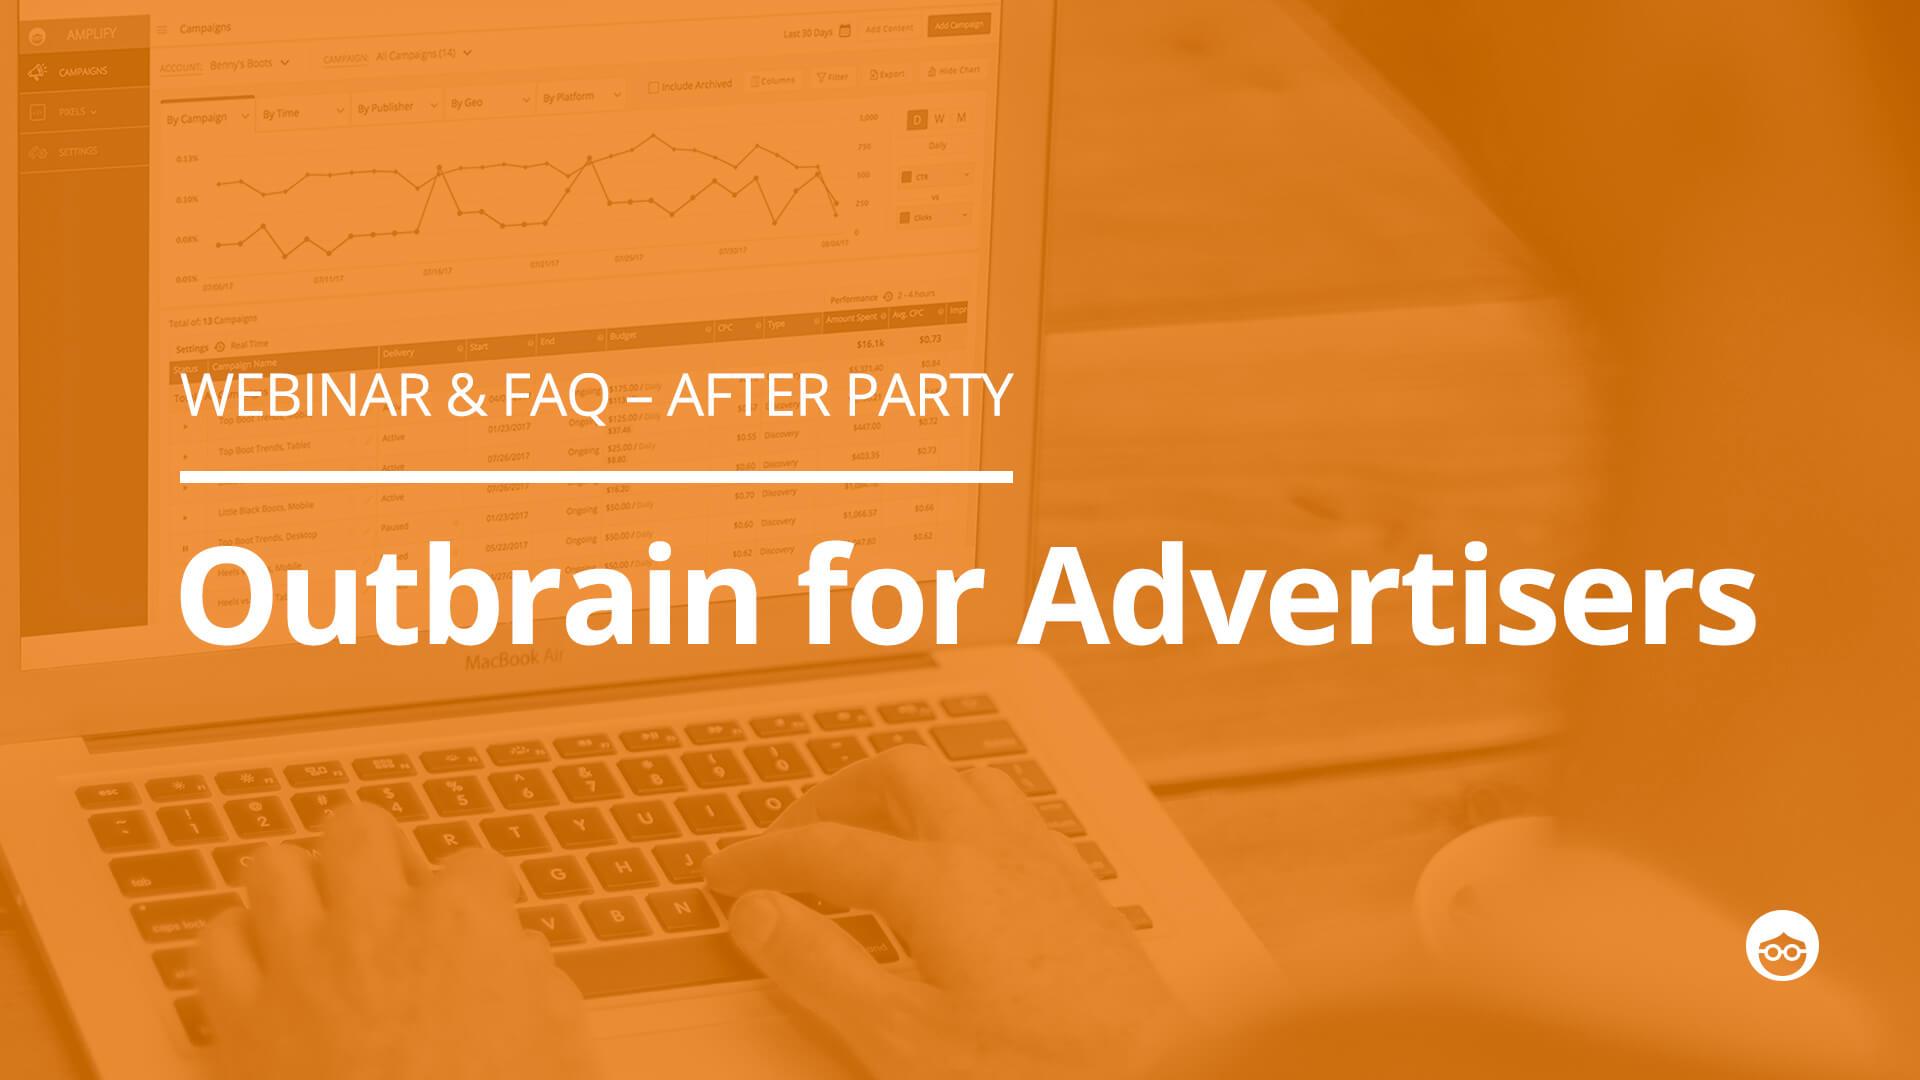 [Webinar Recap] Outbrain for Advertisers: Live FAQ